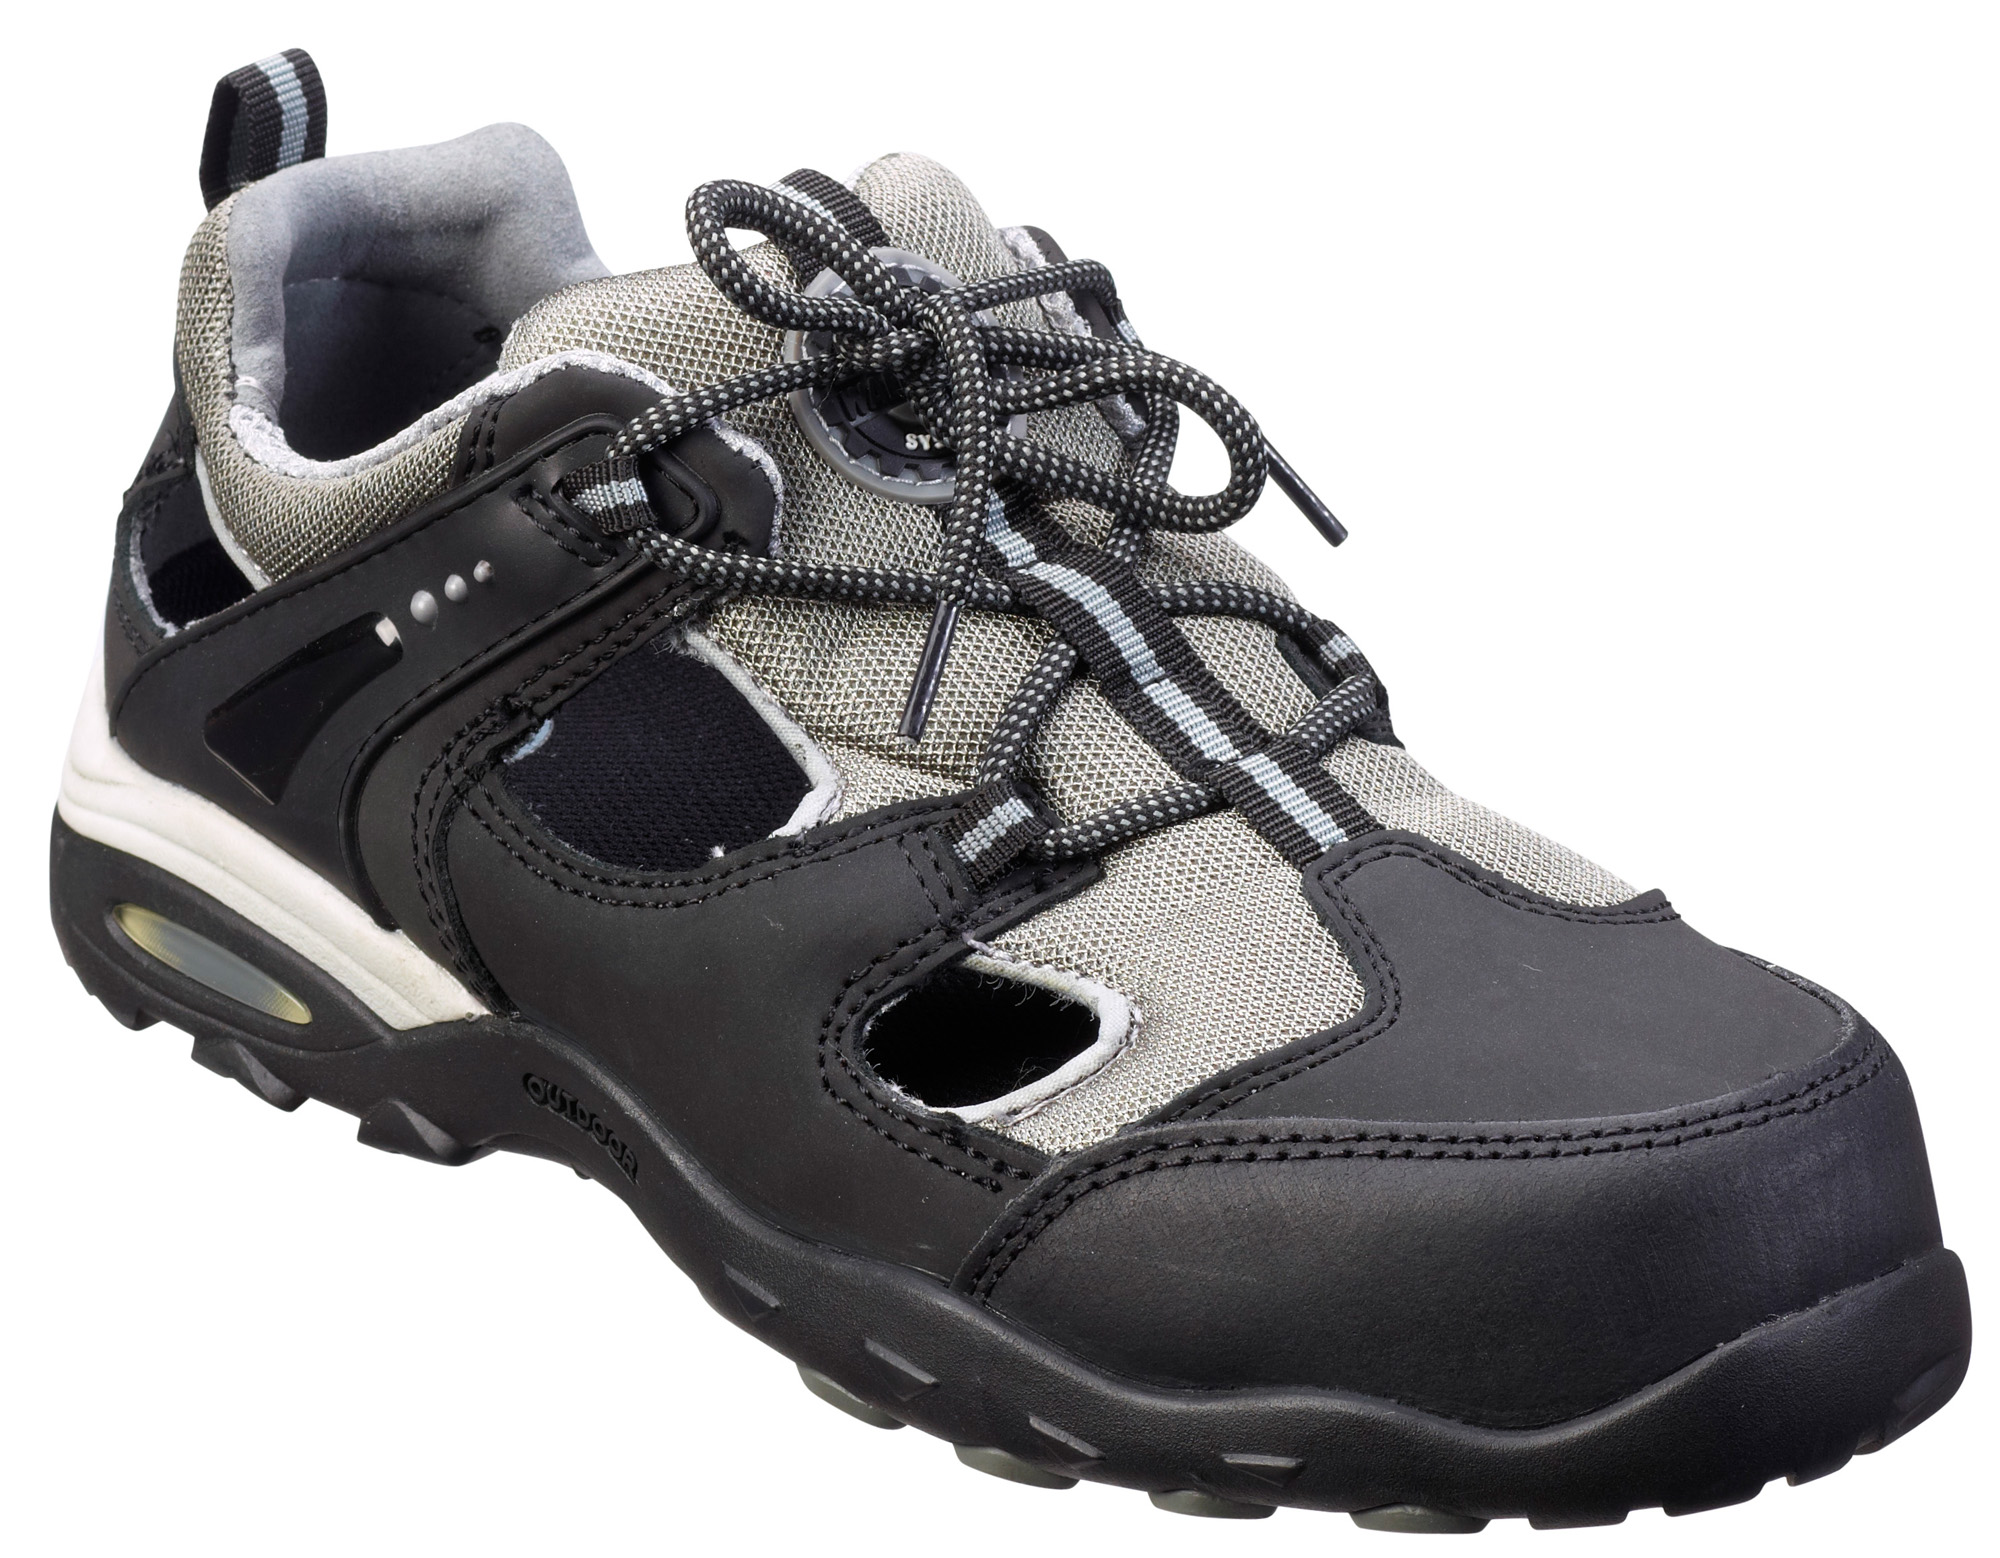 Blaklader Safety Trainer (Composite (Composite (Composite Toe & Midsole) S1P SRC - 2428 e17574